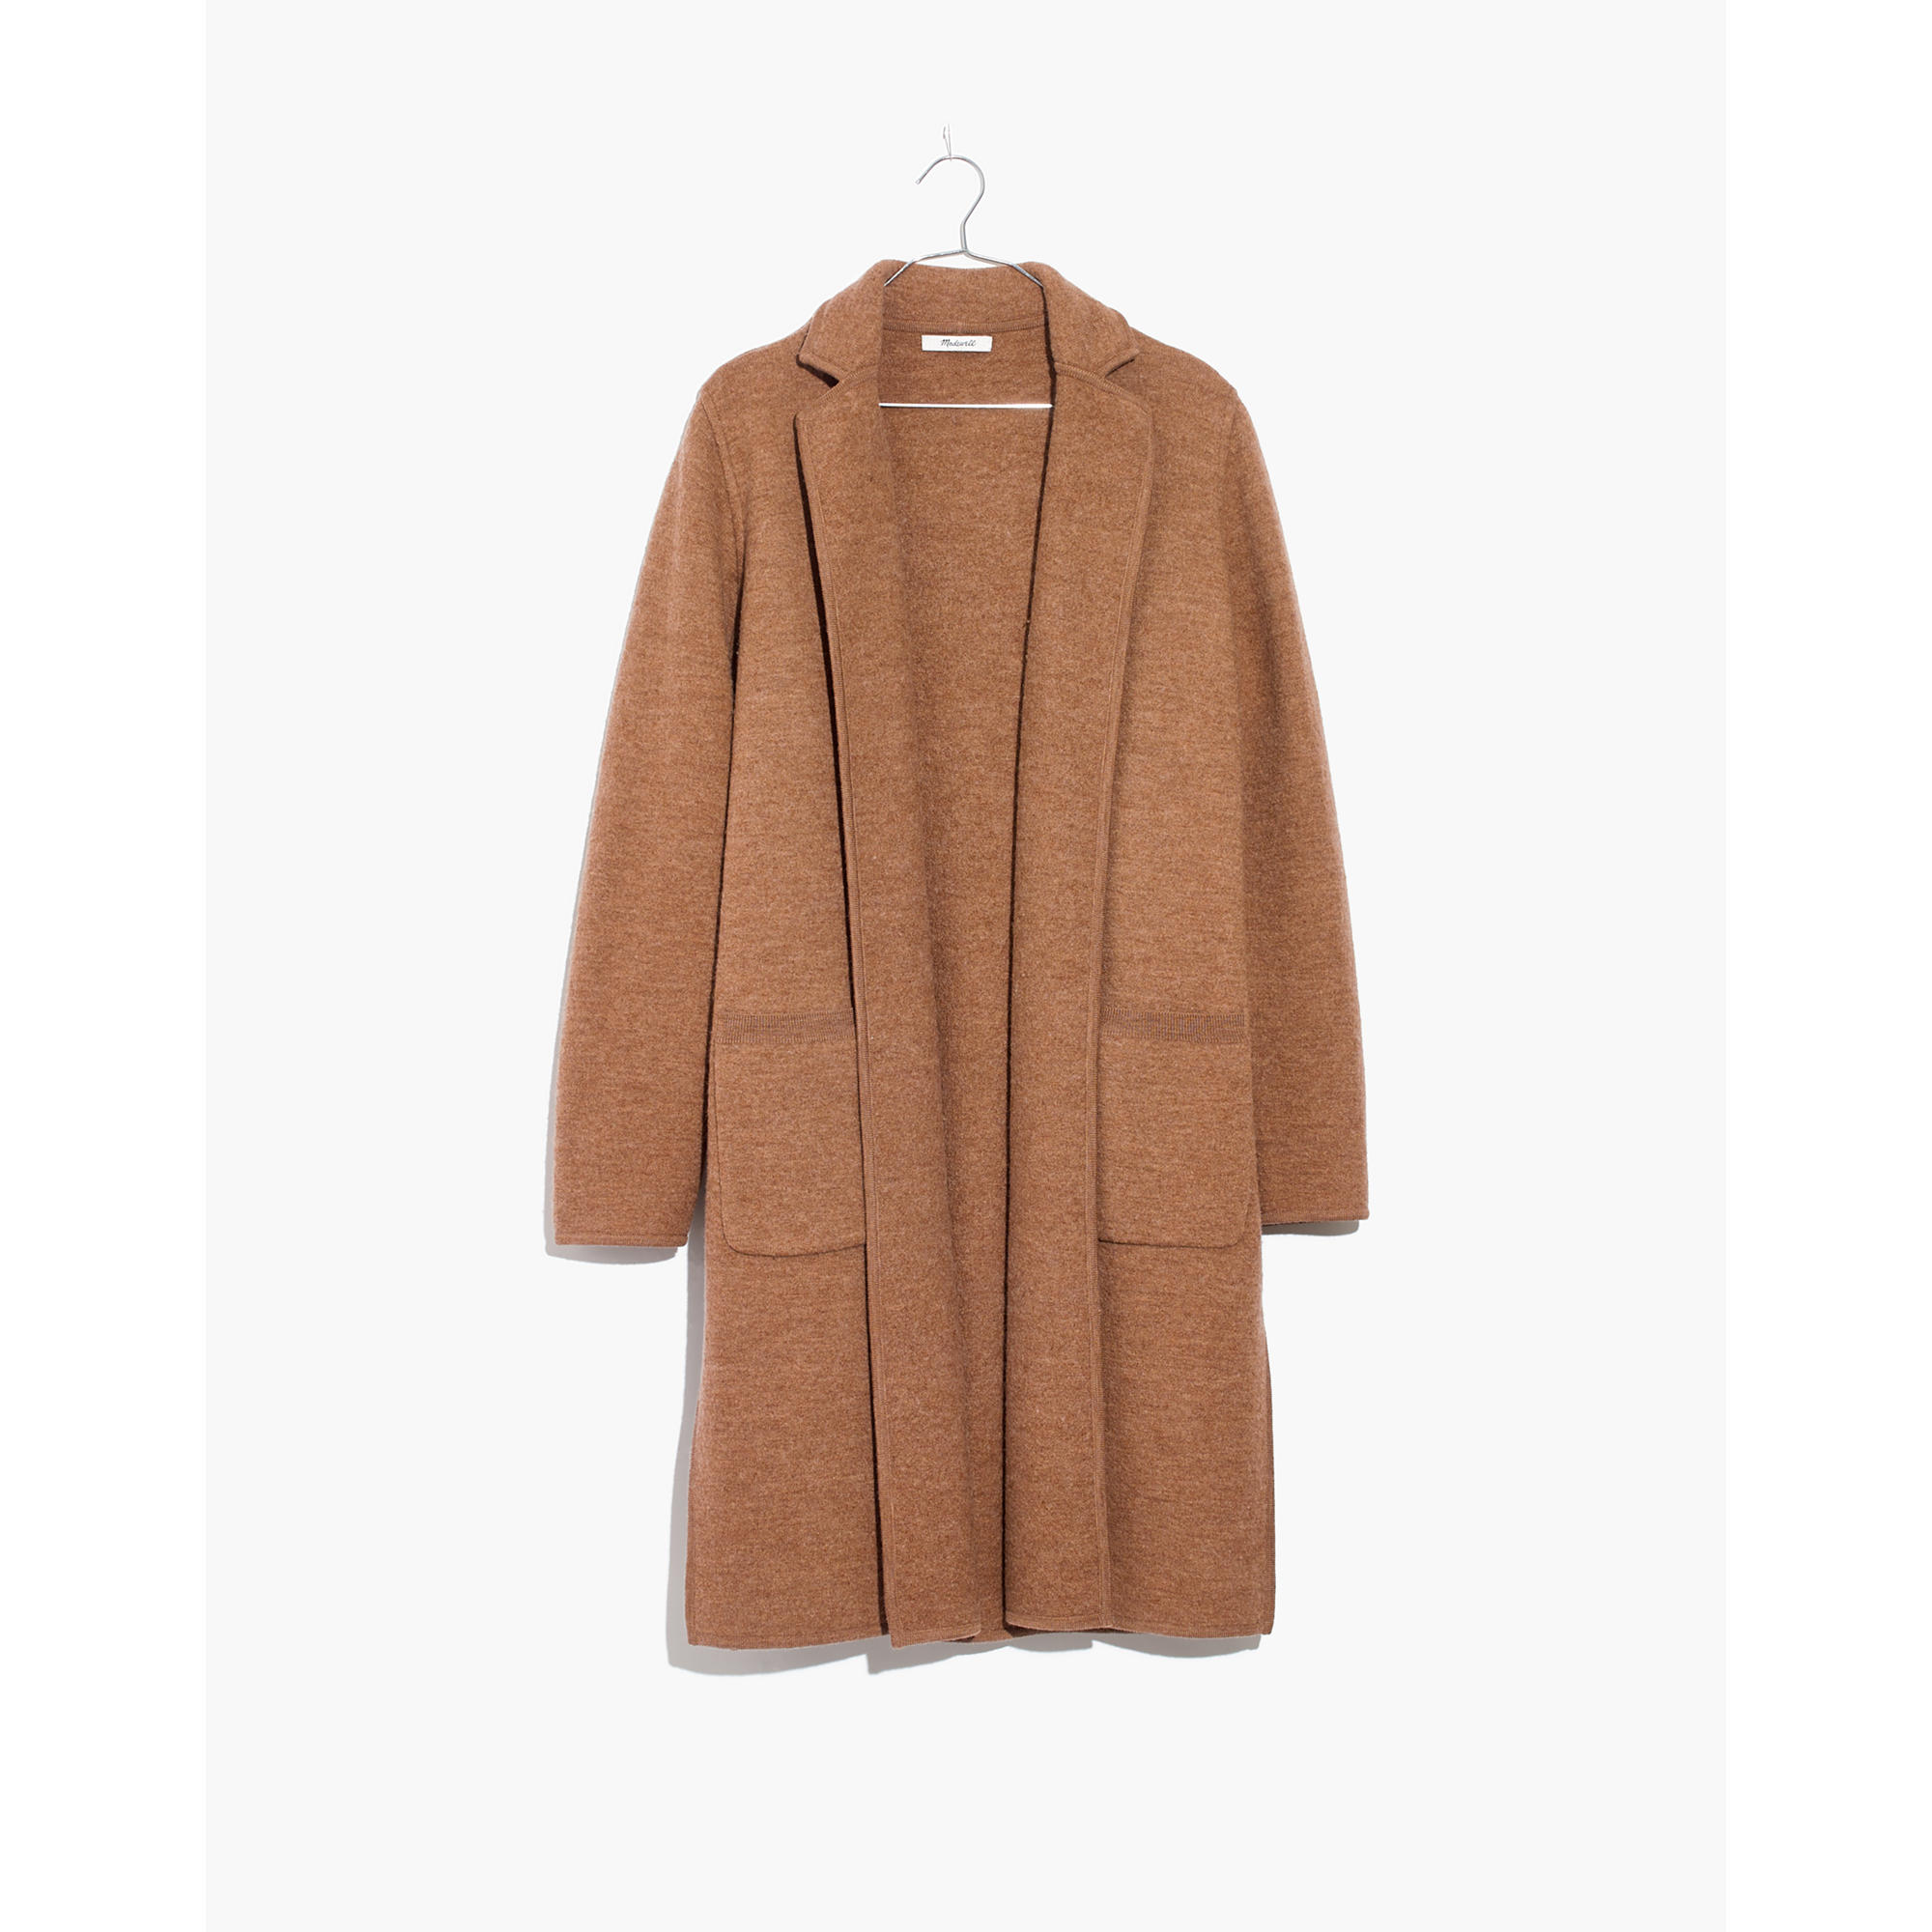 Camden Sweater-Coat : shopmadewell cardigans & sweater-jackets ...